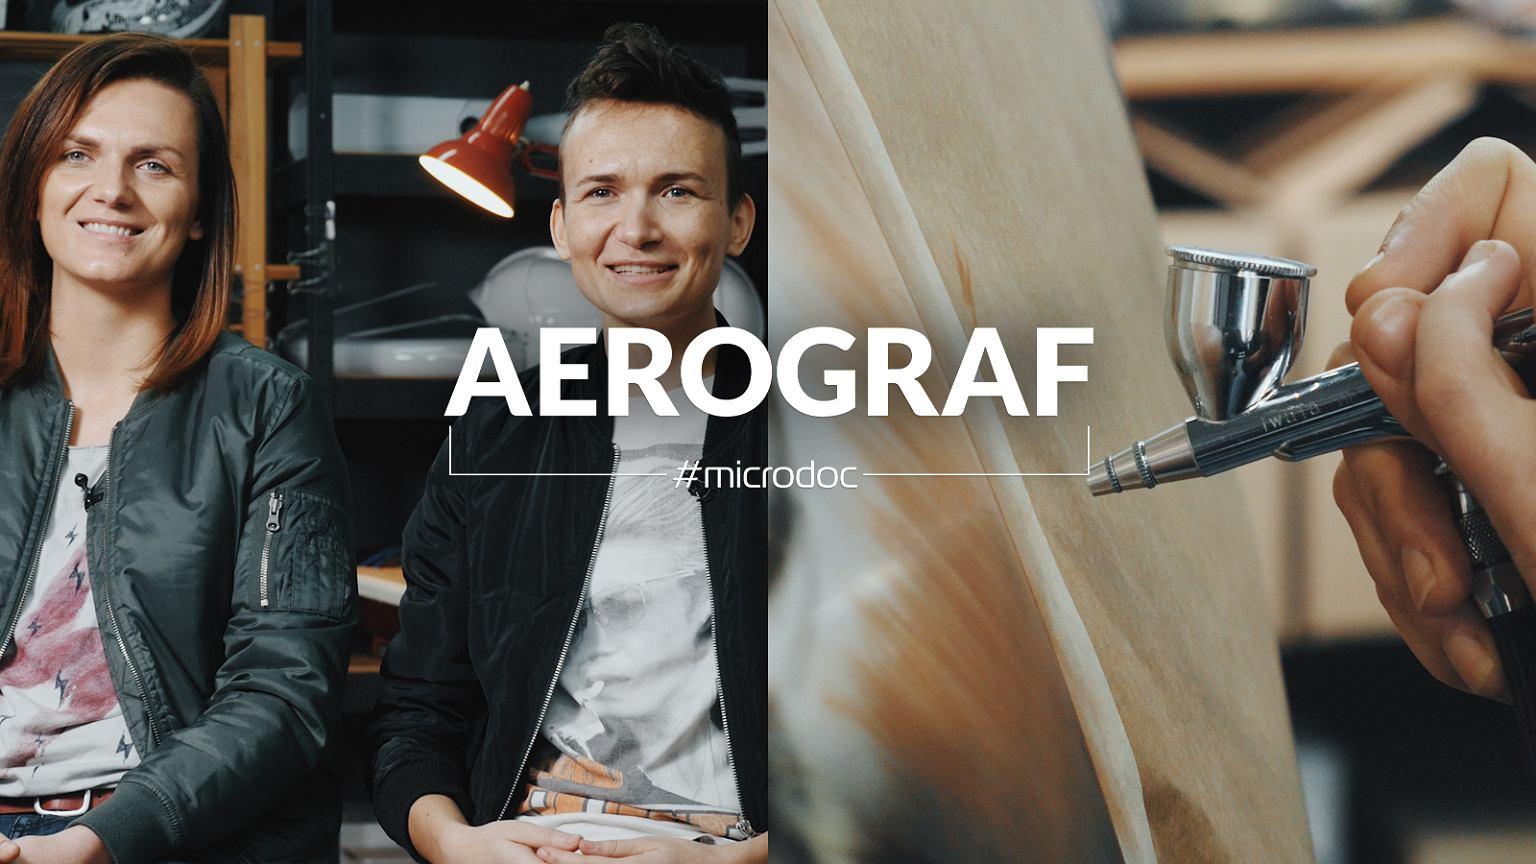 Microdoc Aerograf